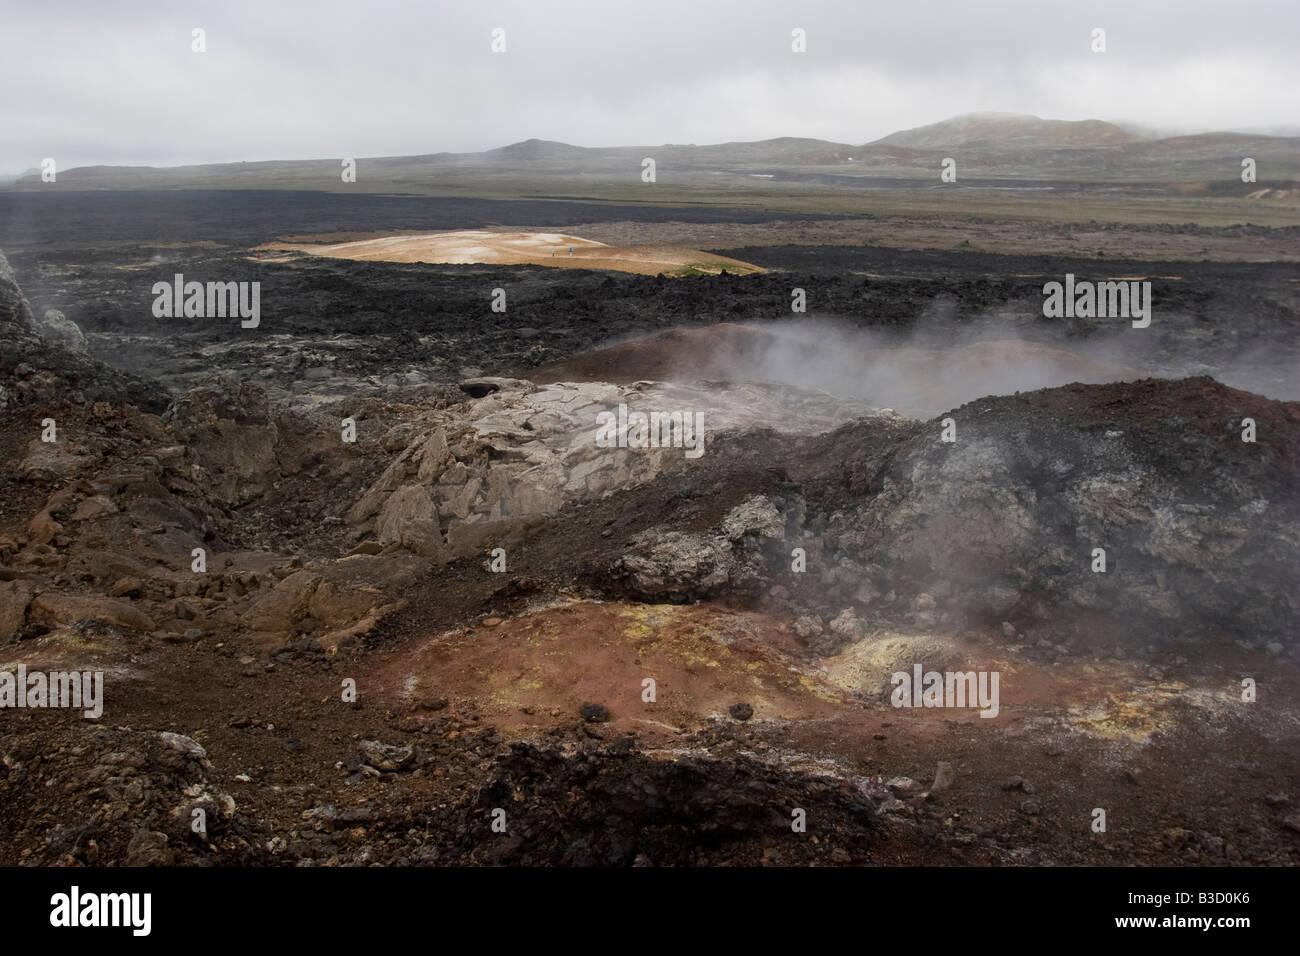 Lava field in the area of Krafla, Myvatn lake, Iceland. - Stock Image